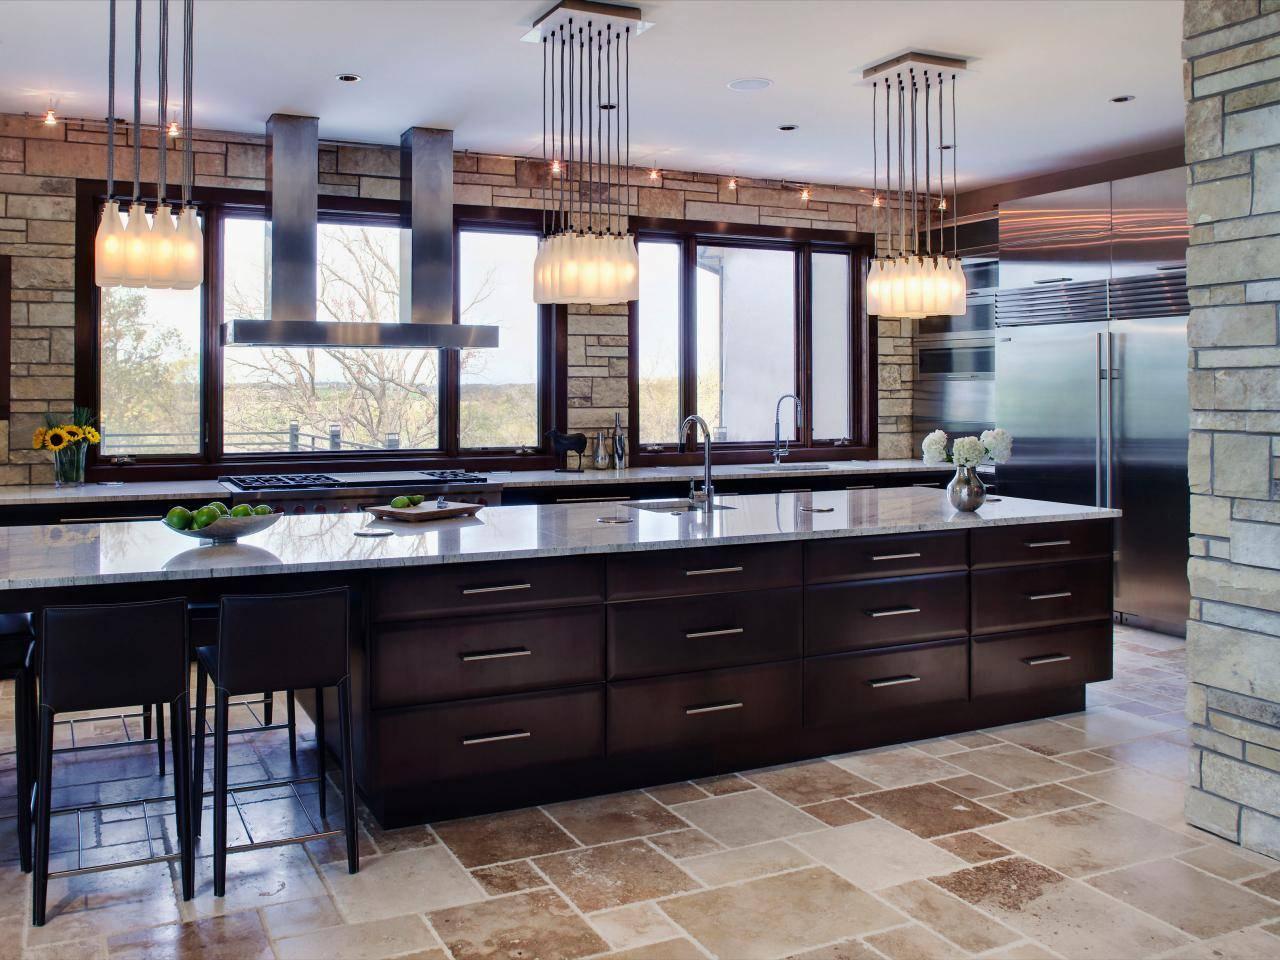 Large Kitchen Islands Hgtv House Plans 157375